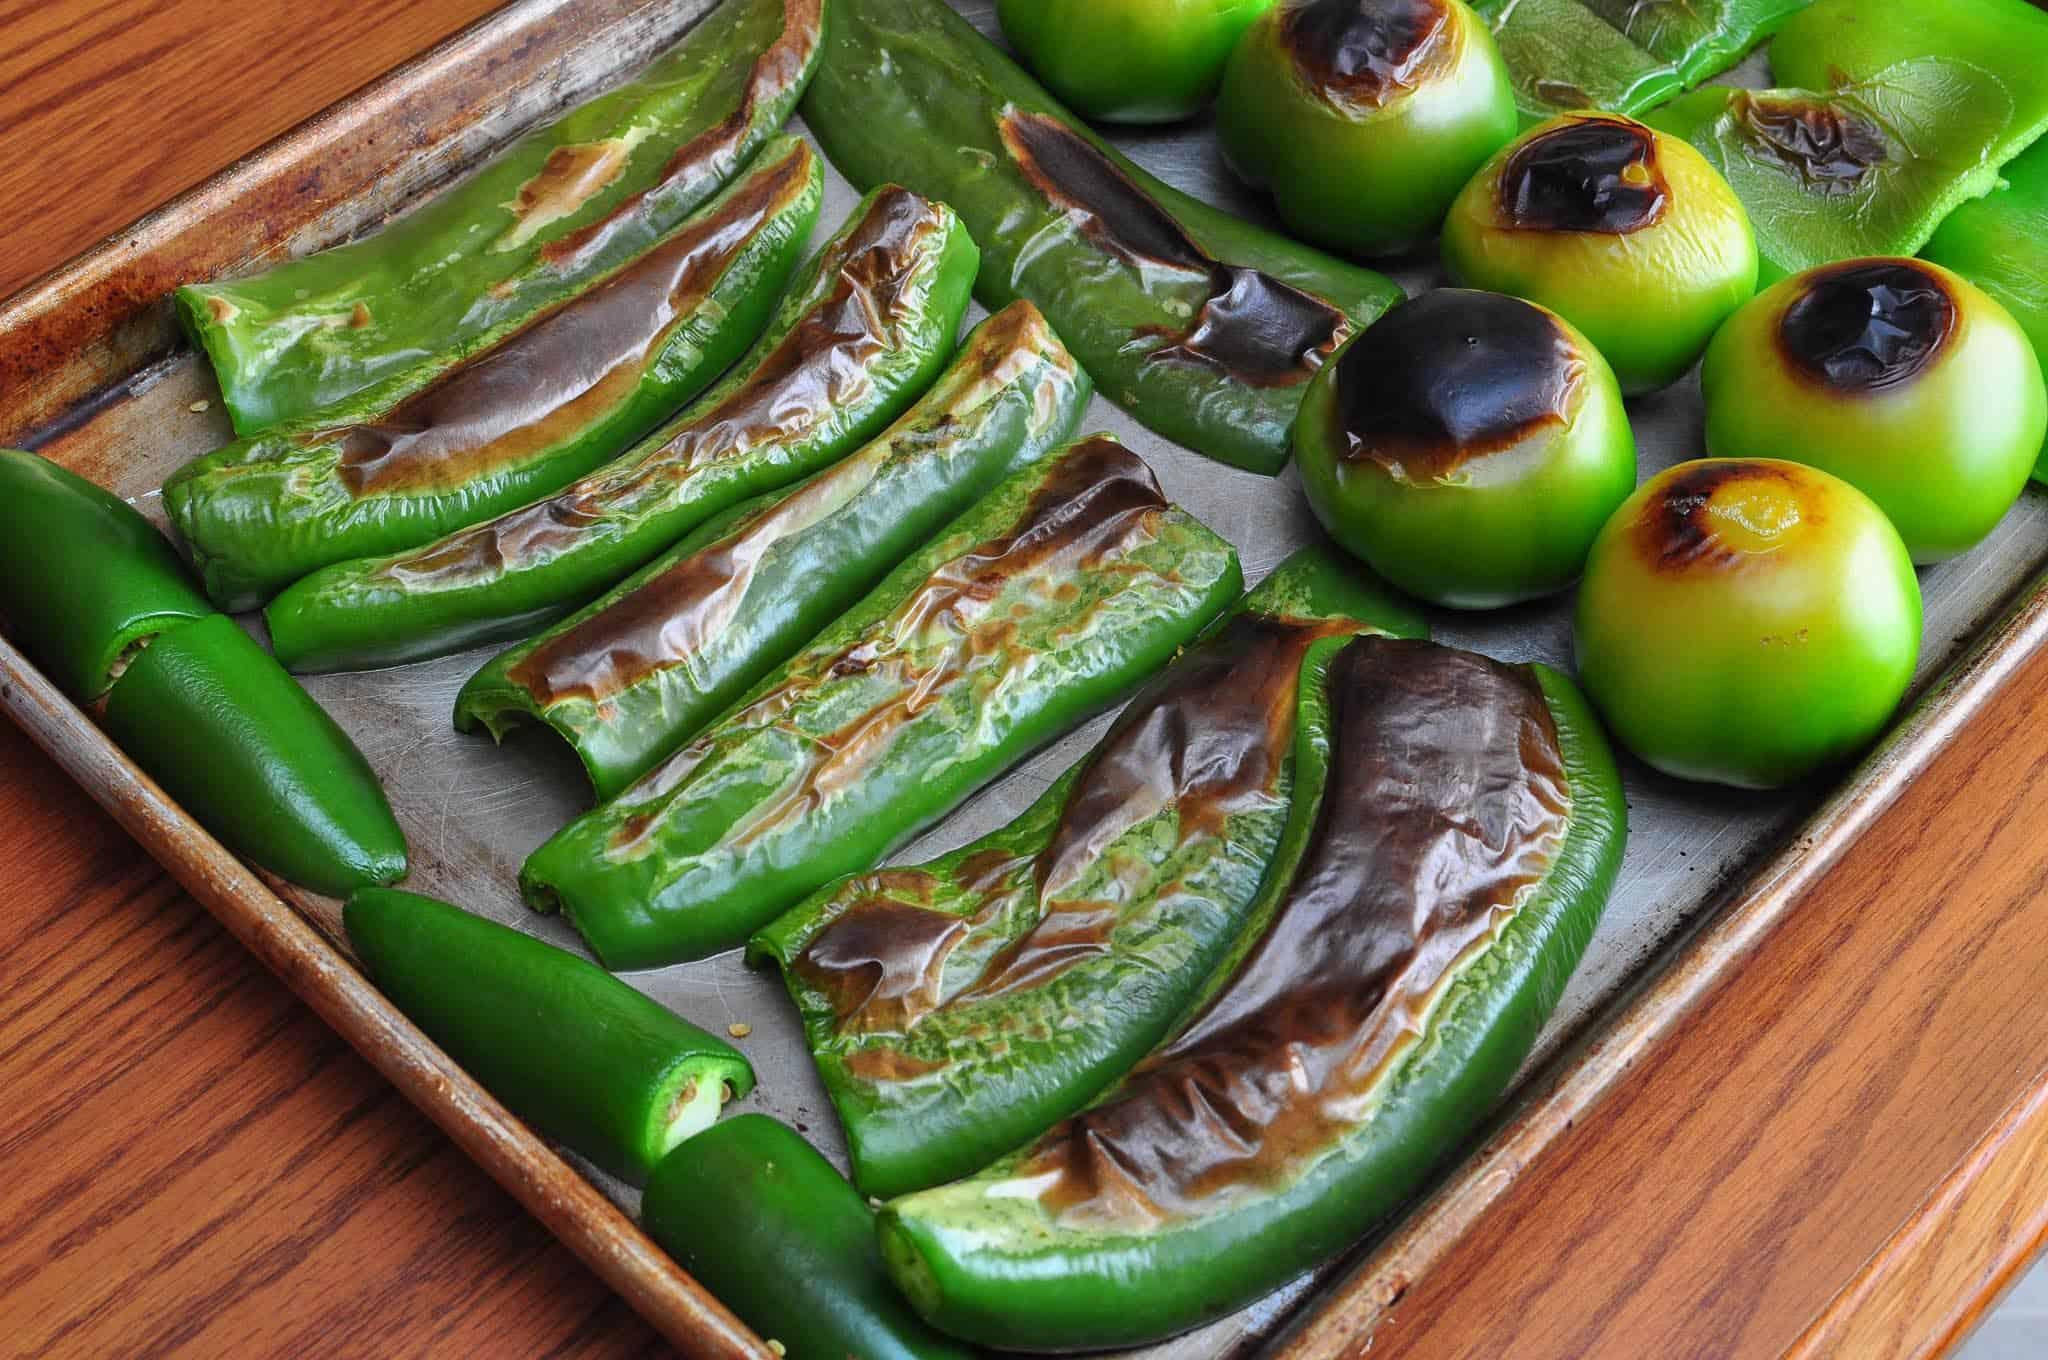 Pressure Cooker Chili Verde Green Pork Chili -4708